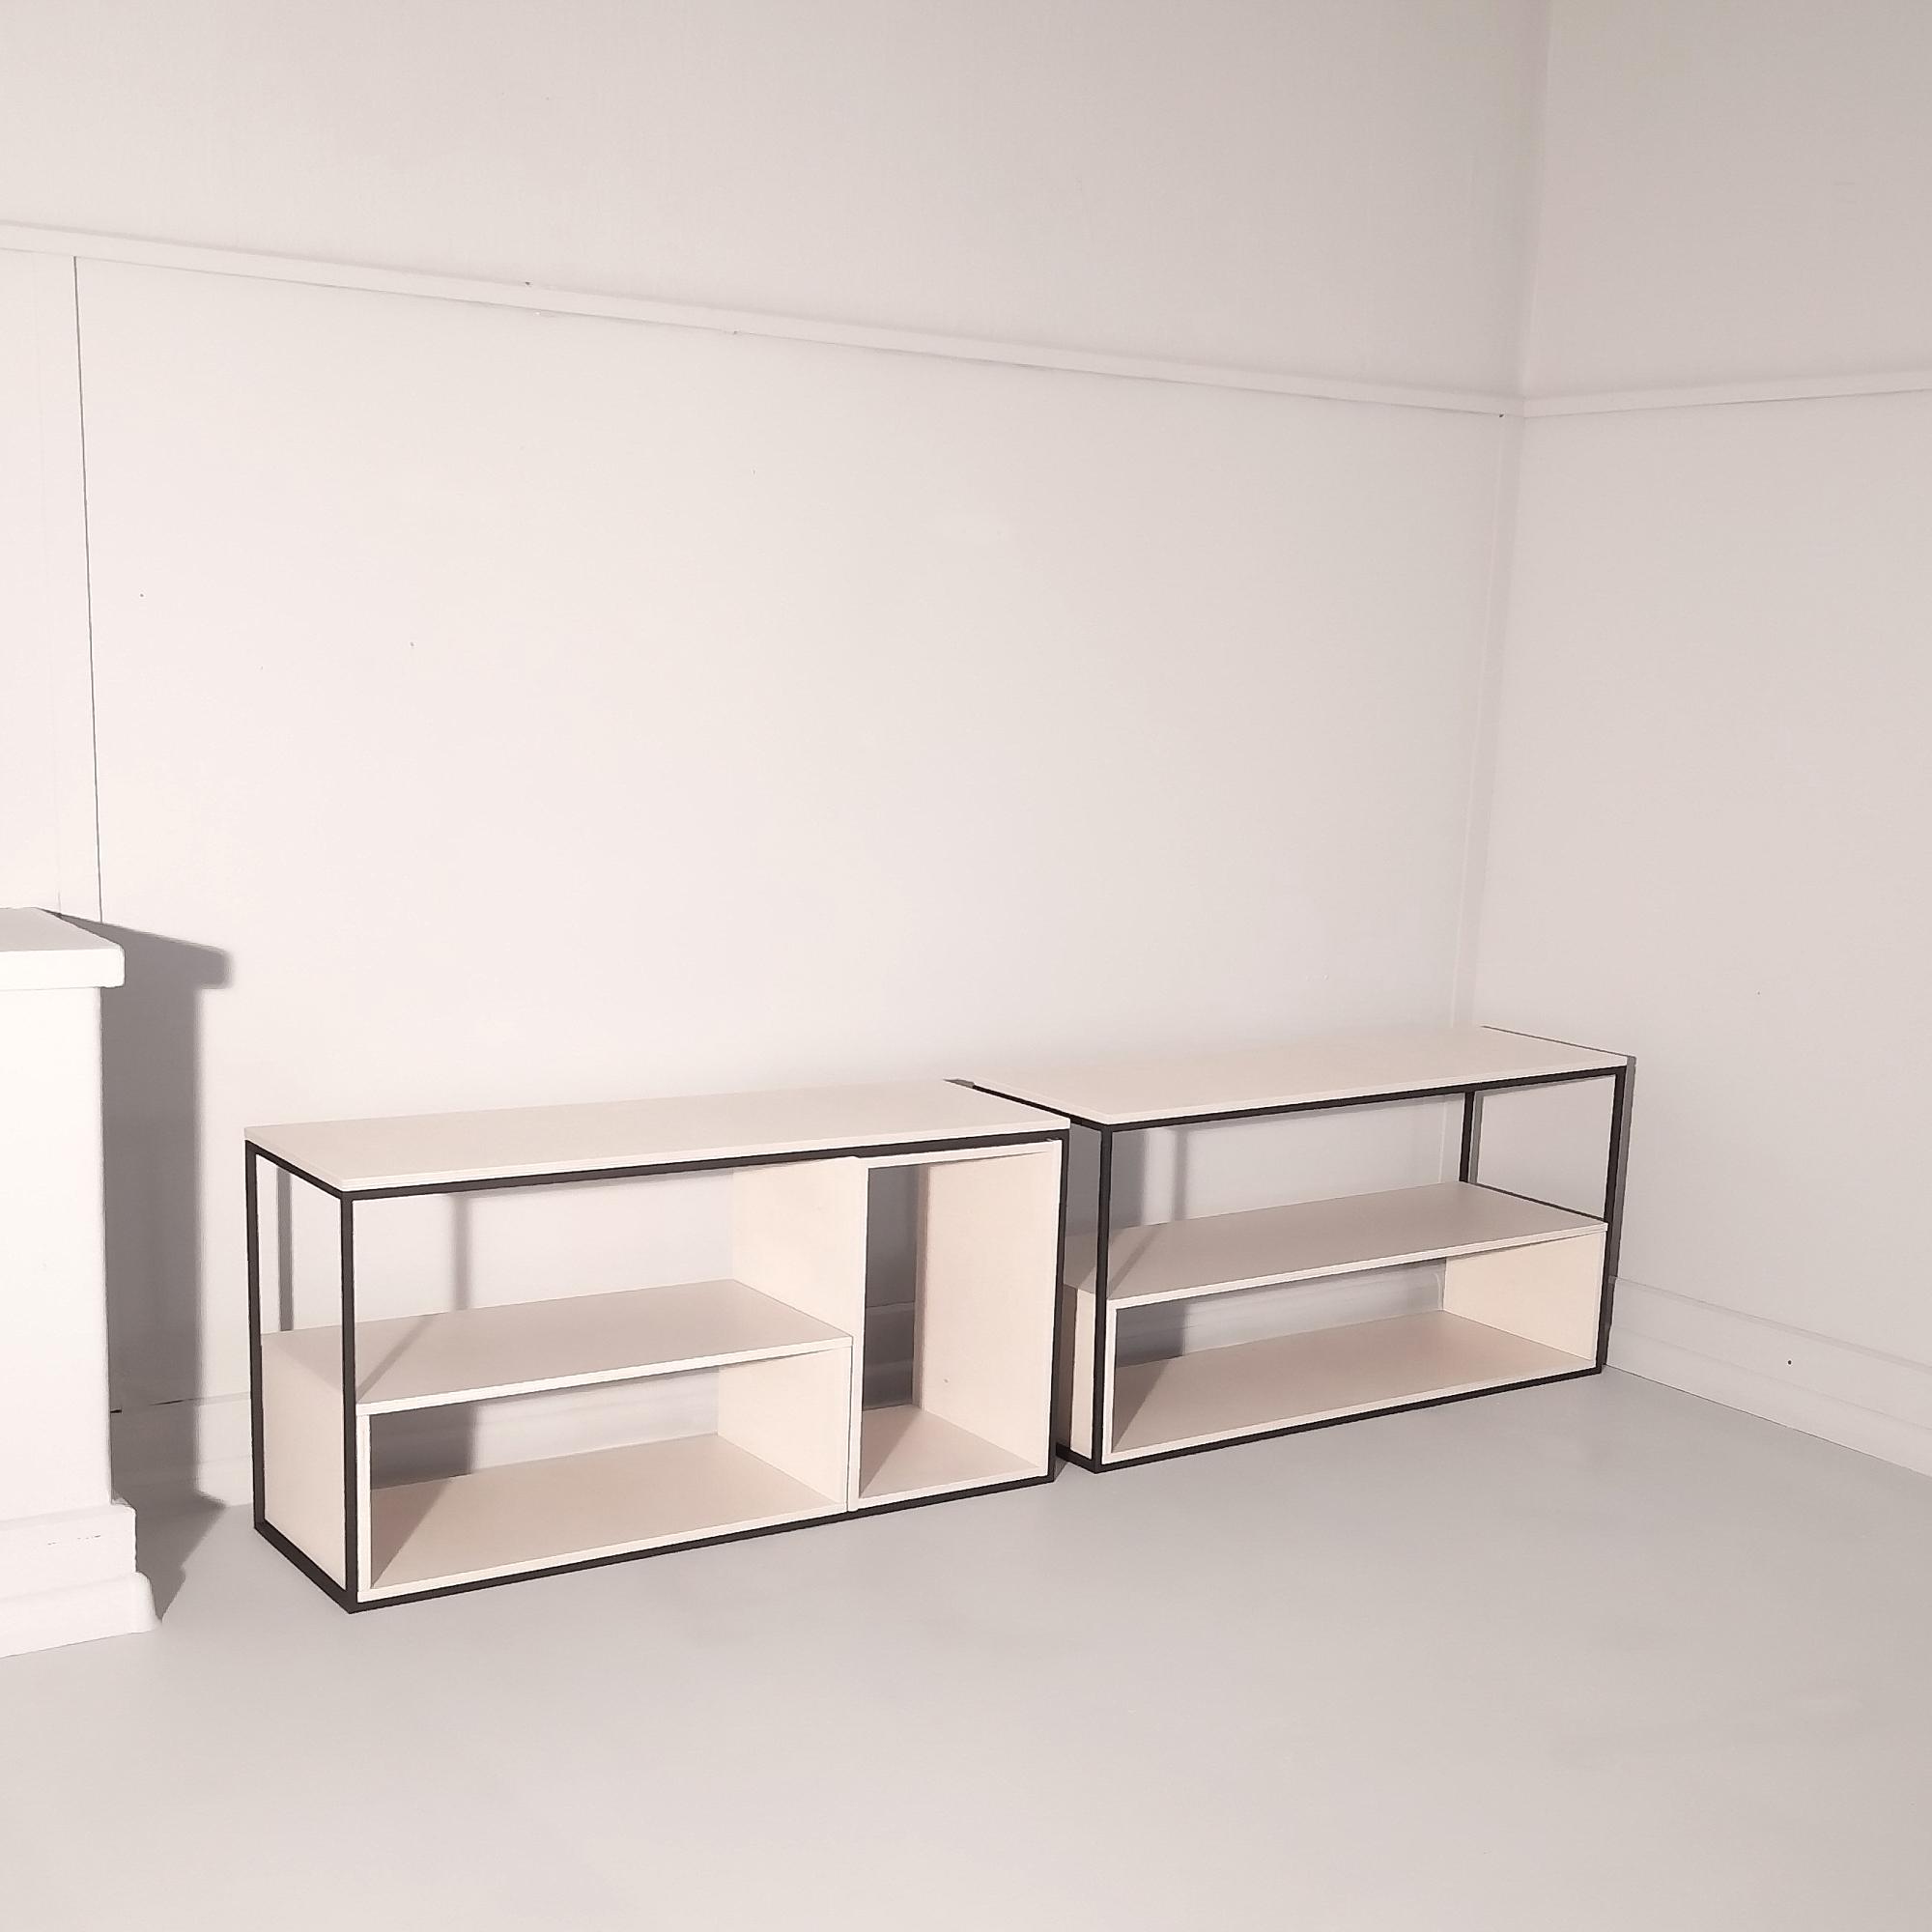 2016-09-14_57d9c33c2b297_nordi_furniture_frame-4.jpg